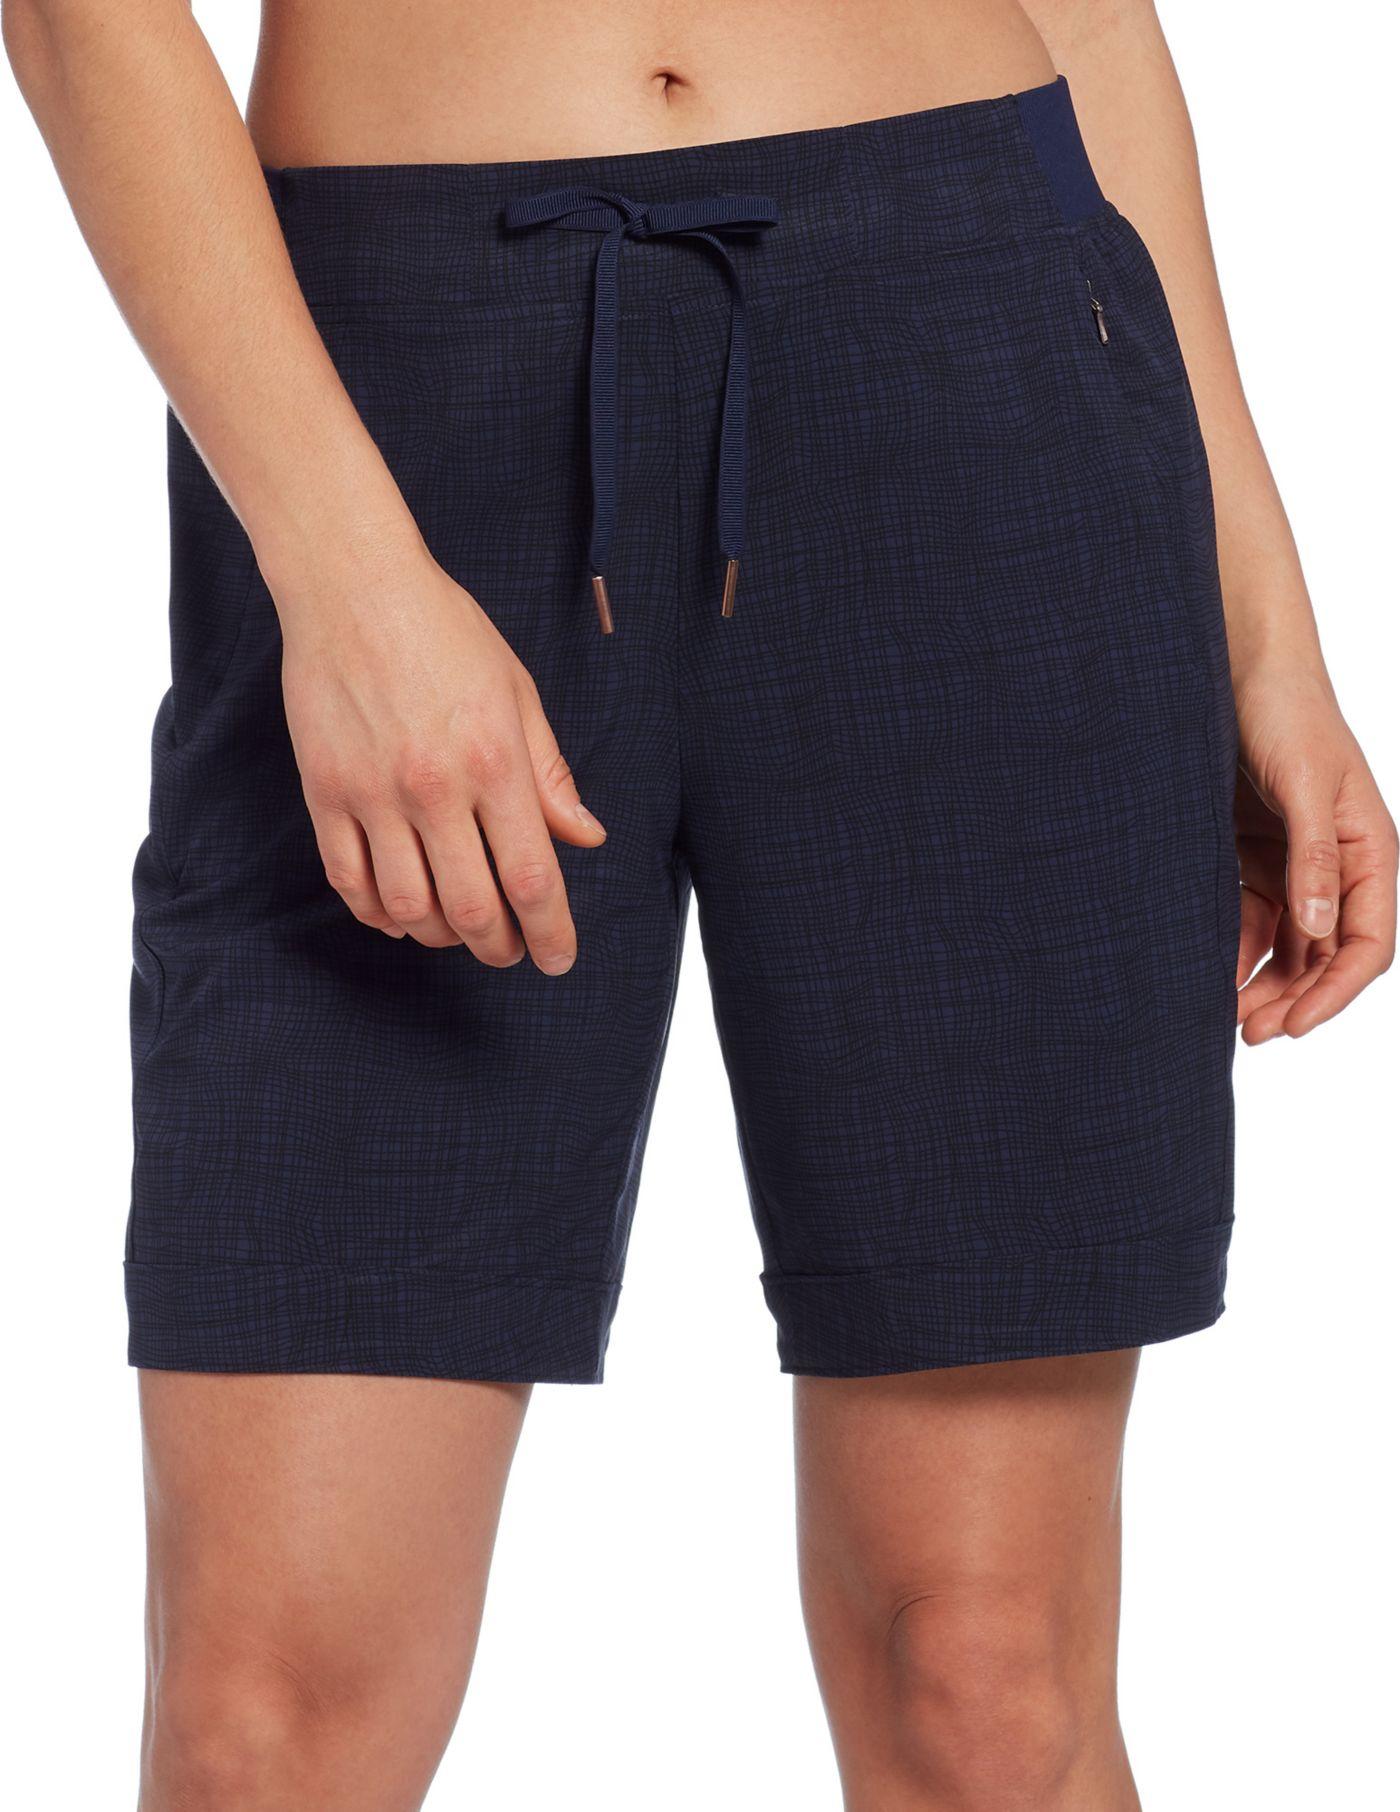 CALIA by Carrie Underwood Women's Anywhere Printed Bermuda Shorts